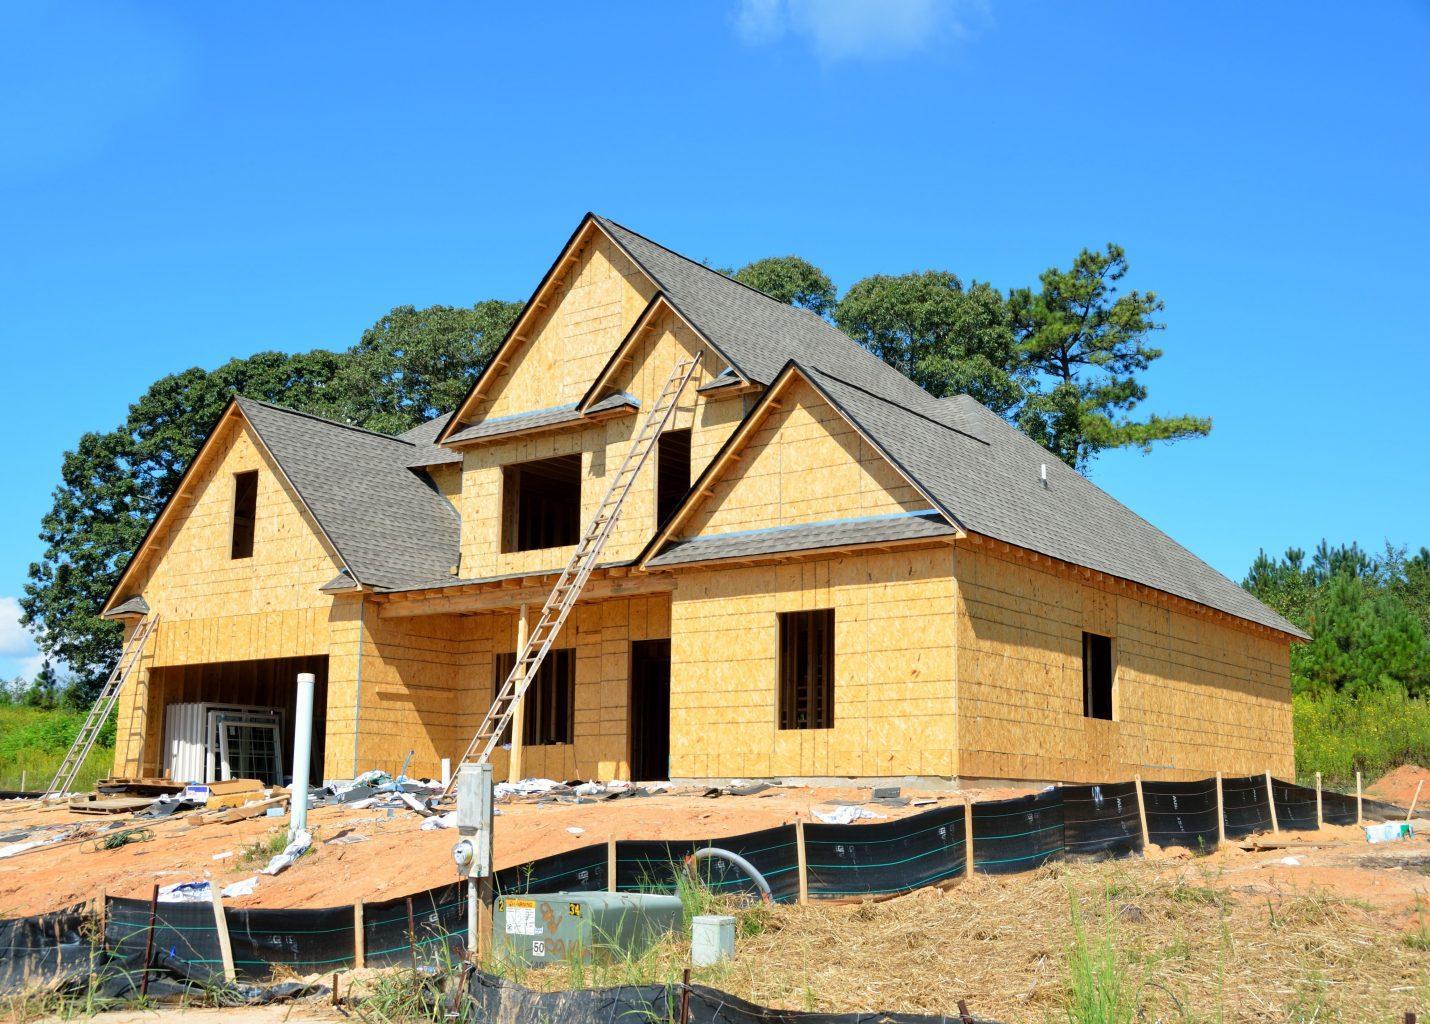 steel-building-as-side-renovation